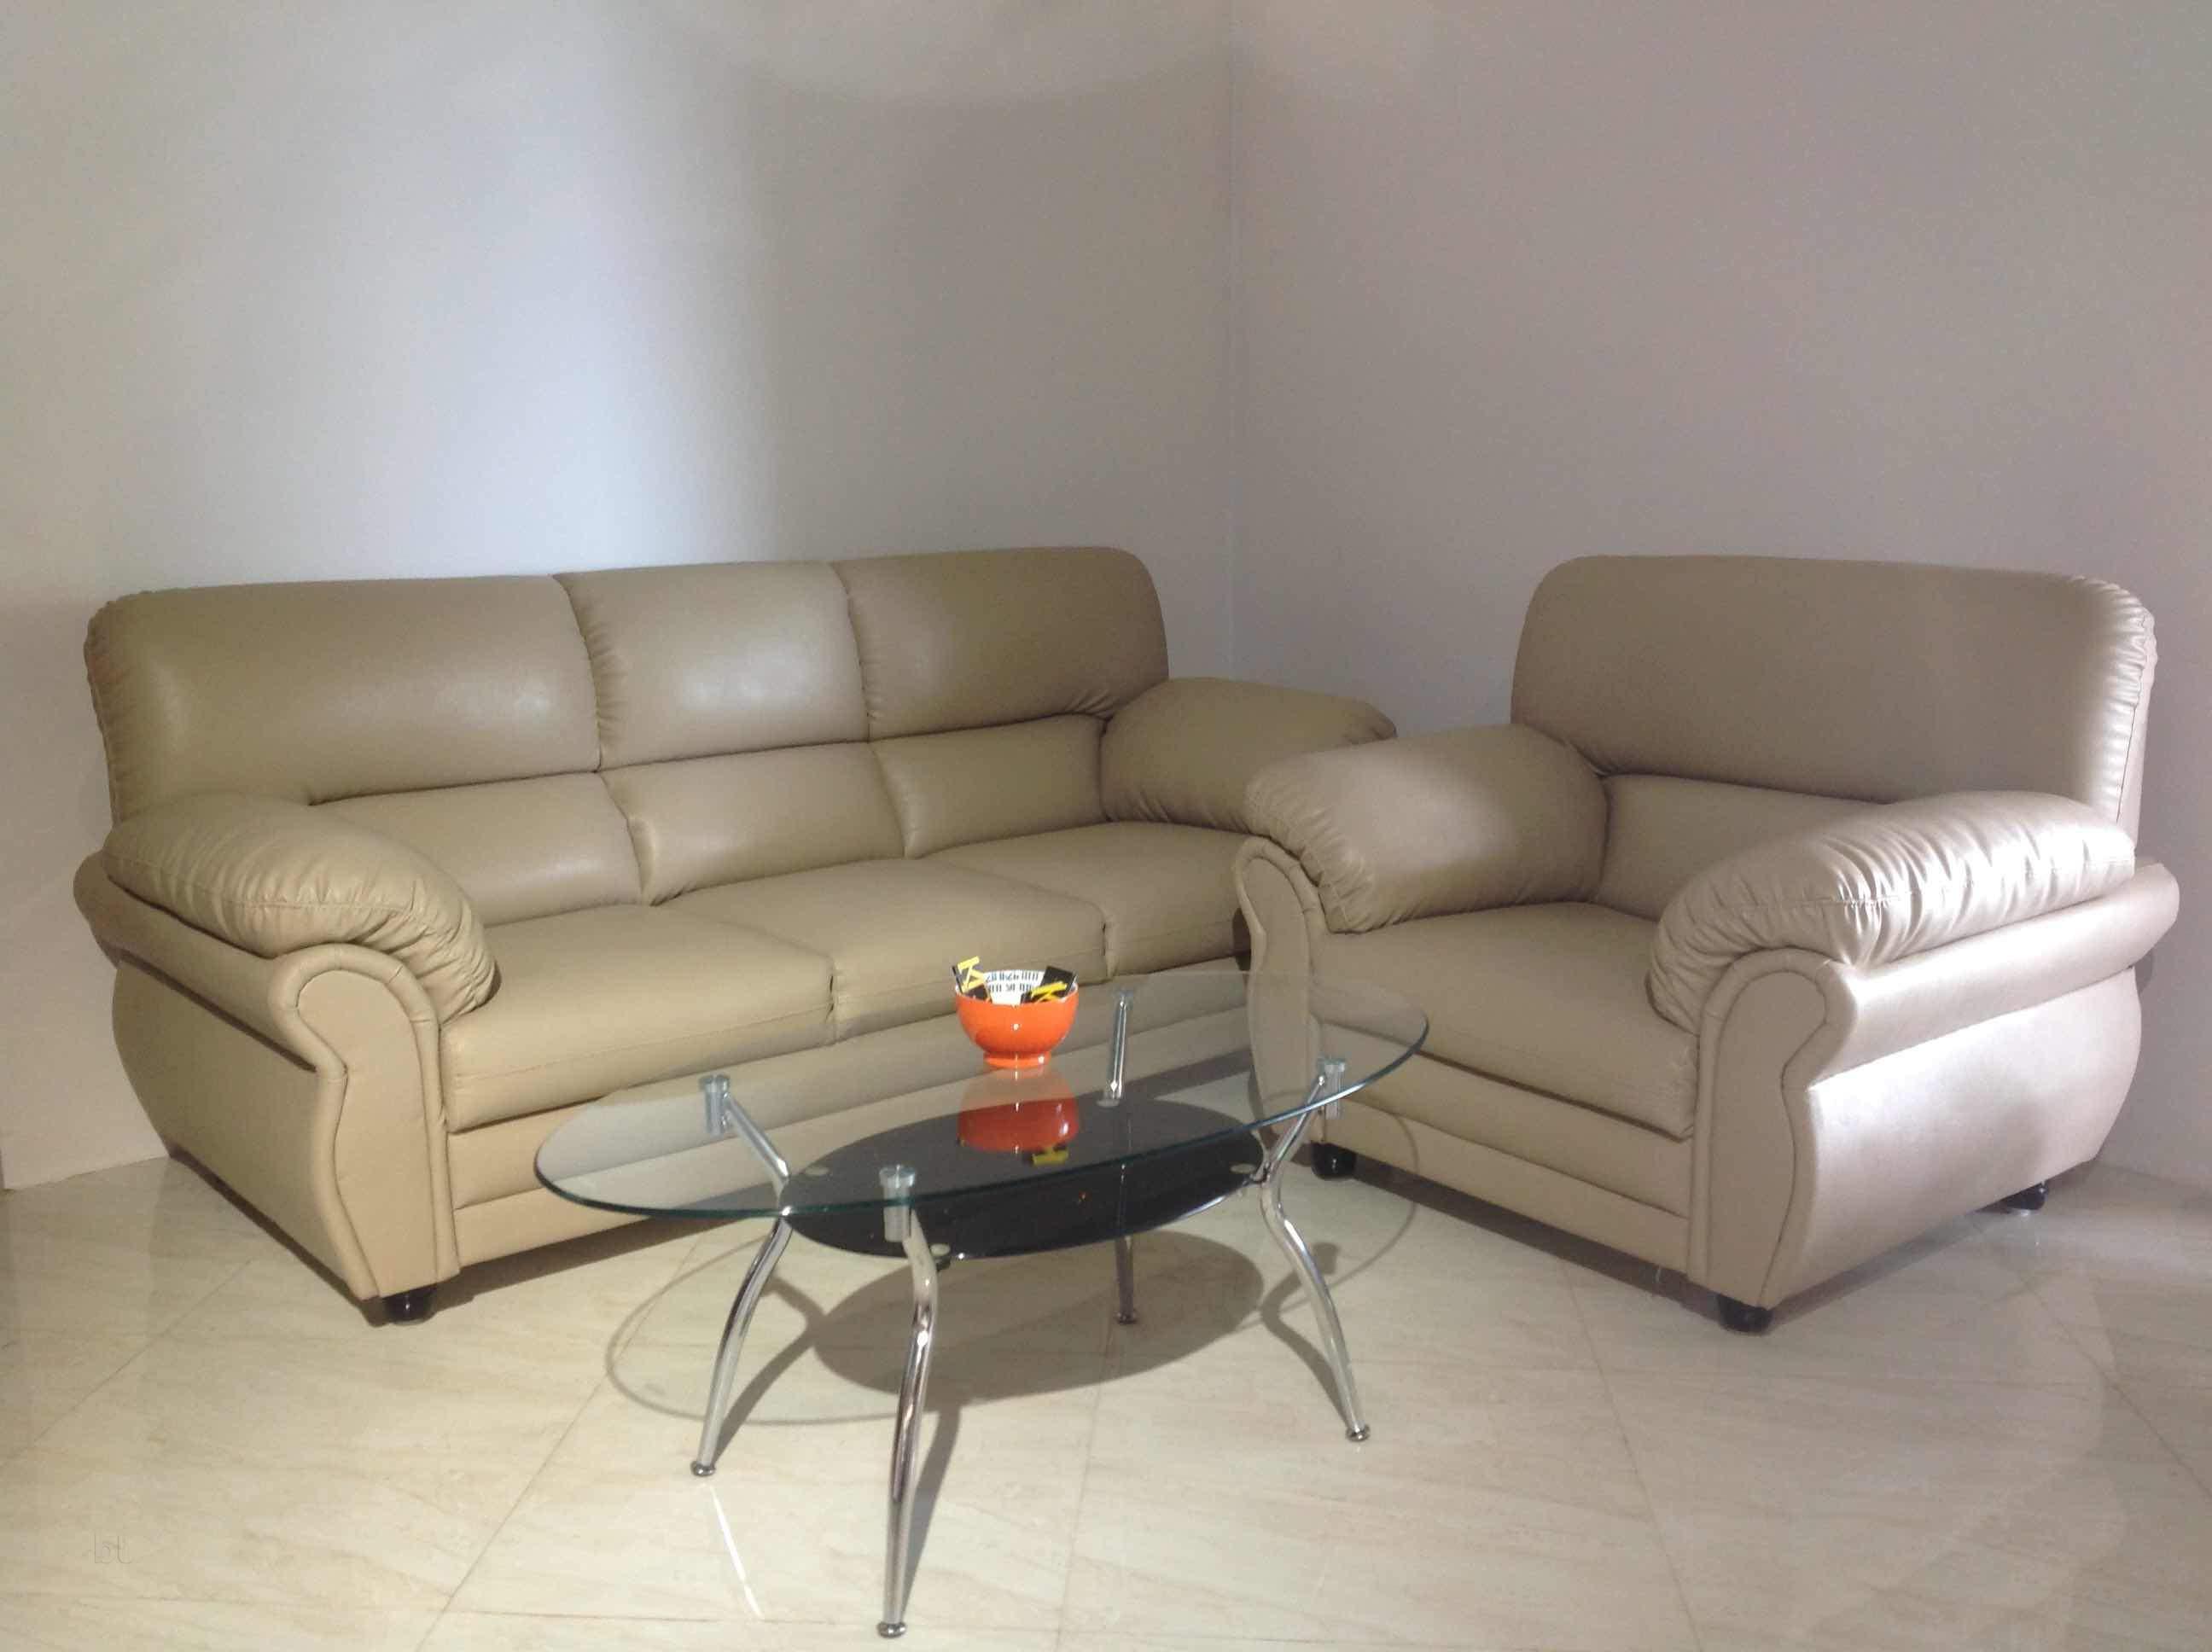 Newest Kiara Living, Vijaynagar 1st Stage – Furniture Dealers In Mysore With Regard To Kiara Sofa Chairs (View 11 of 20)